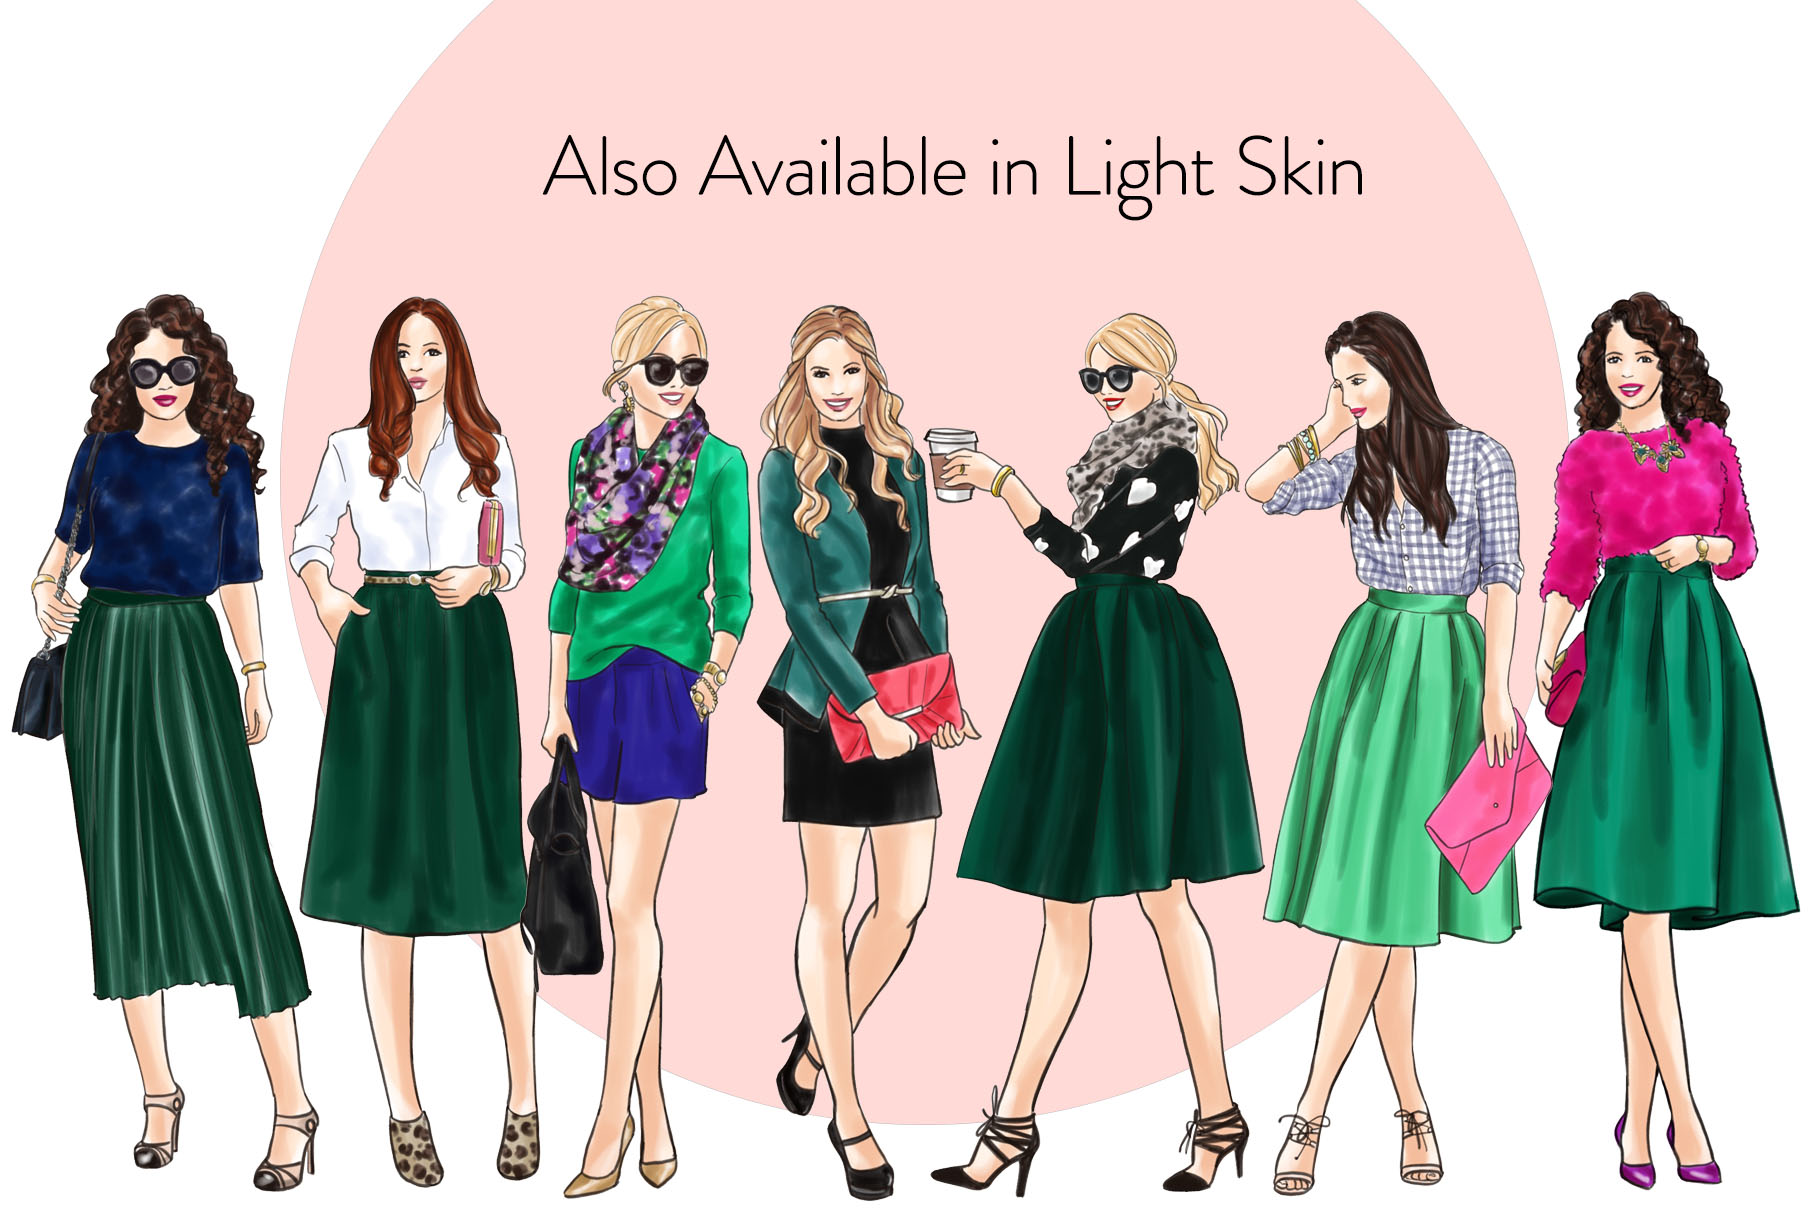 Fashion illustration clipart - Girls in Green 2 - Dark Skin example image 4